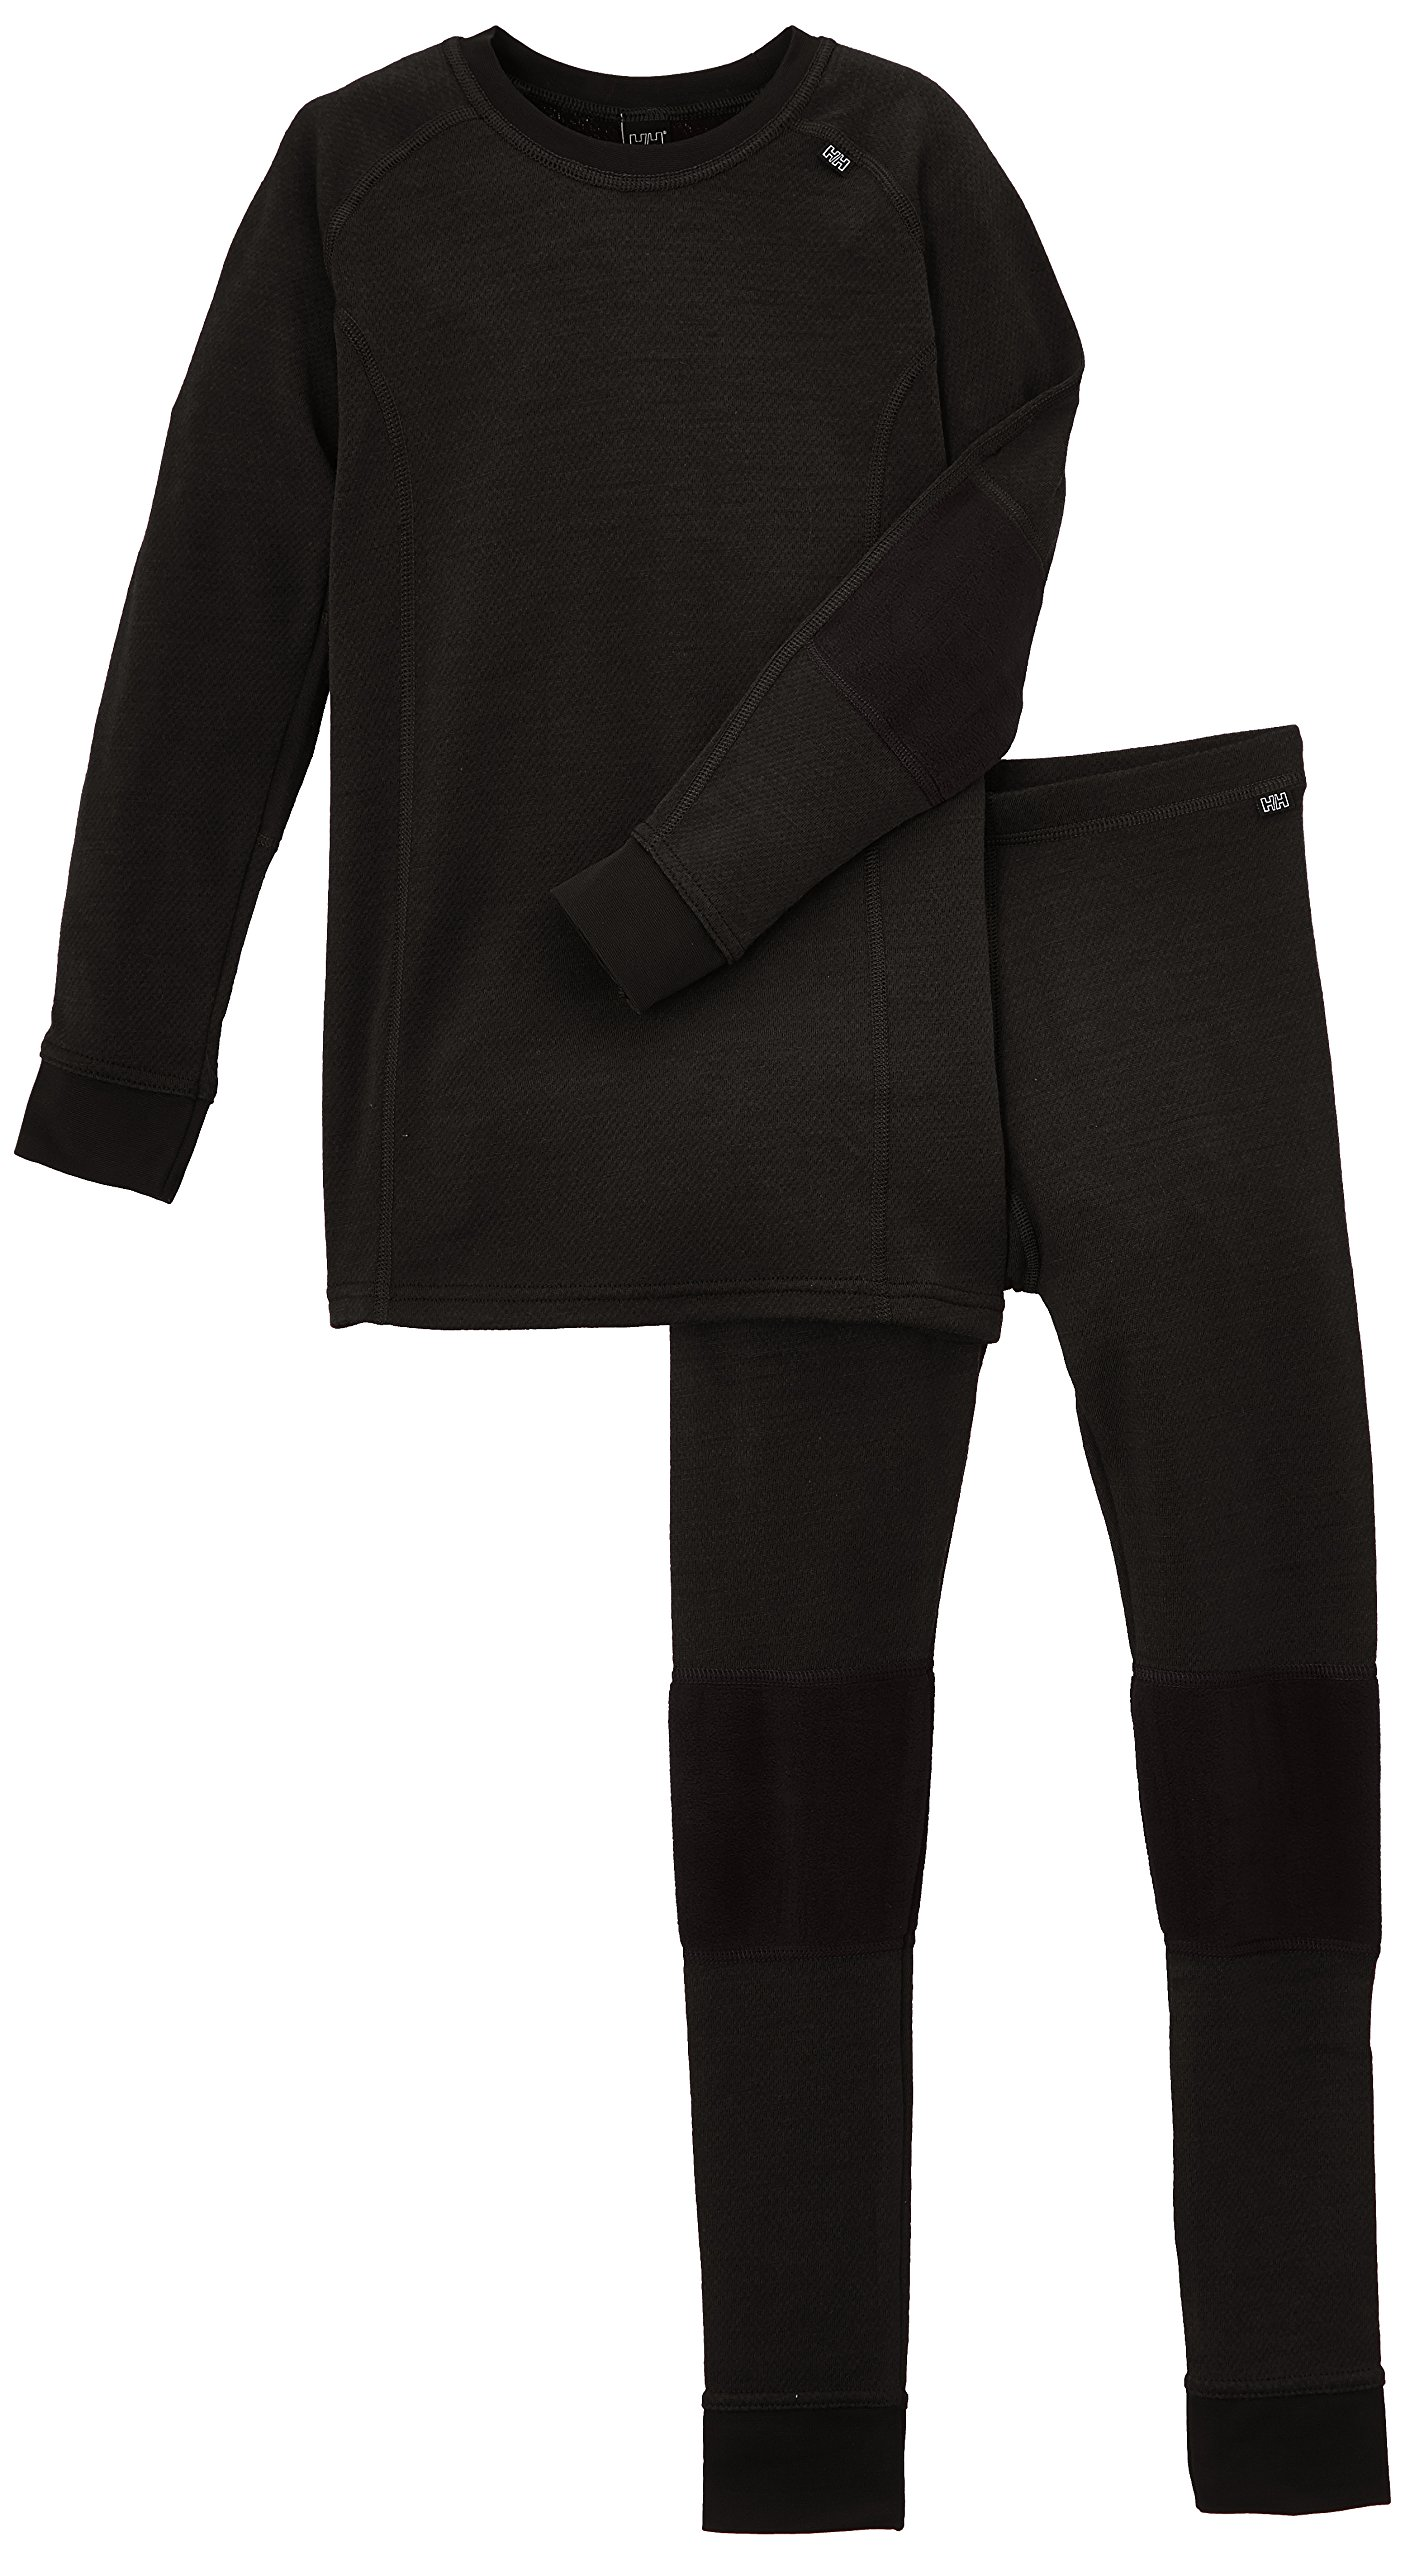 Helly Hansen Junior Lifa Merino Baselayer Set, Black, Size 10 by Helly Hansen (Image #1)